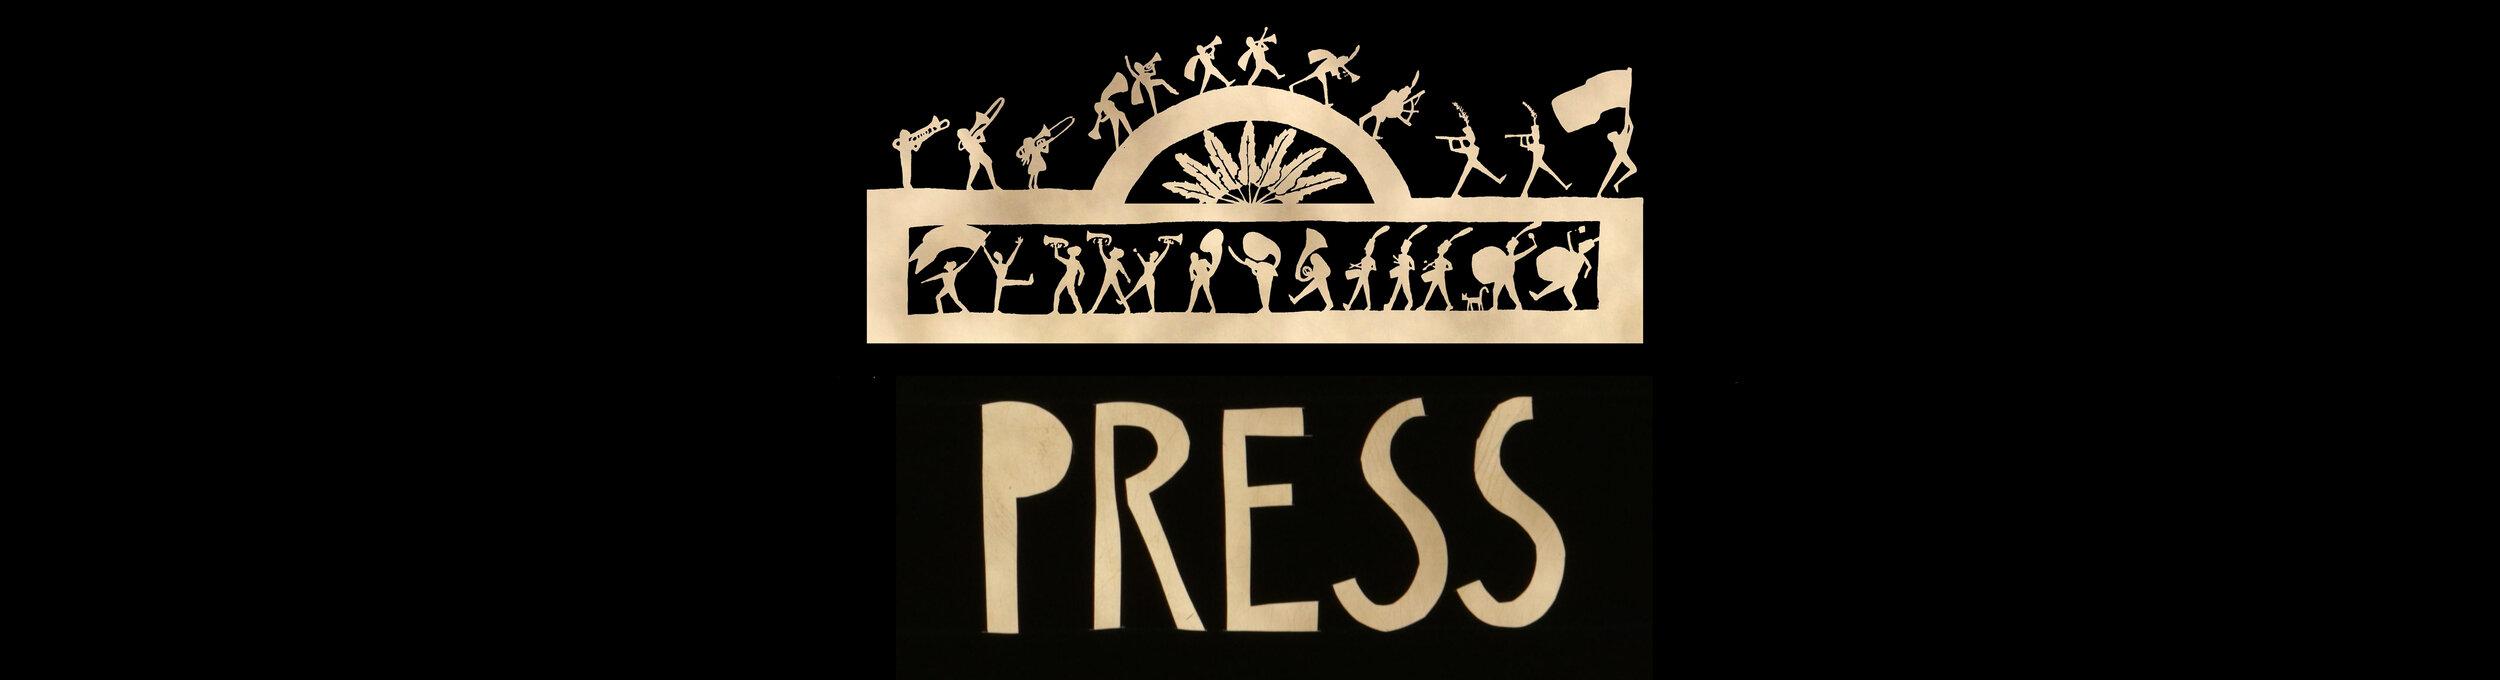 Press Logo 3.jpg